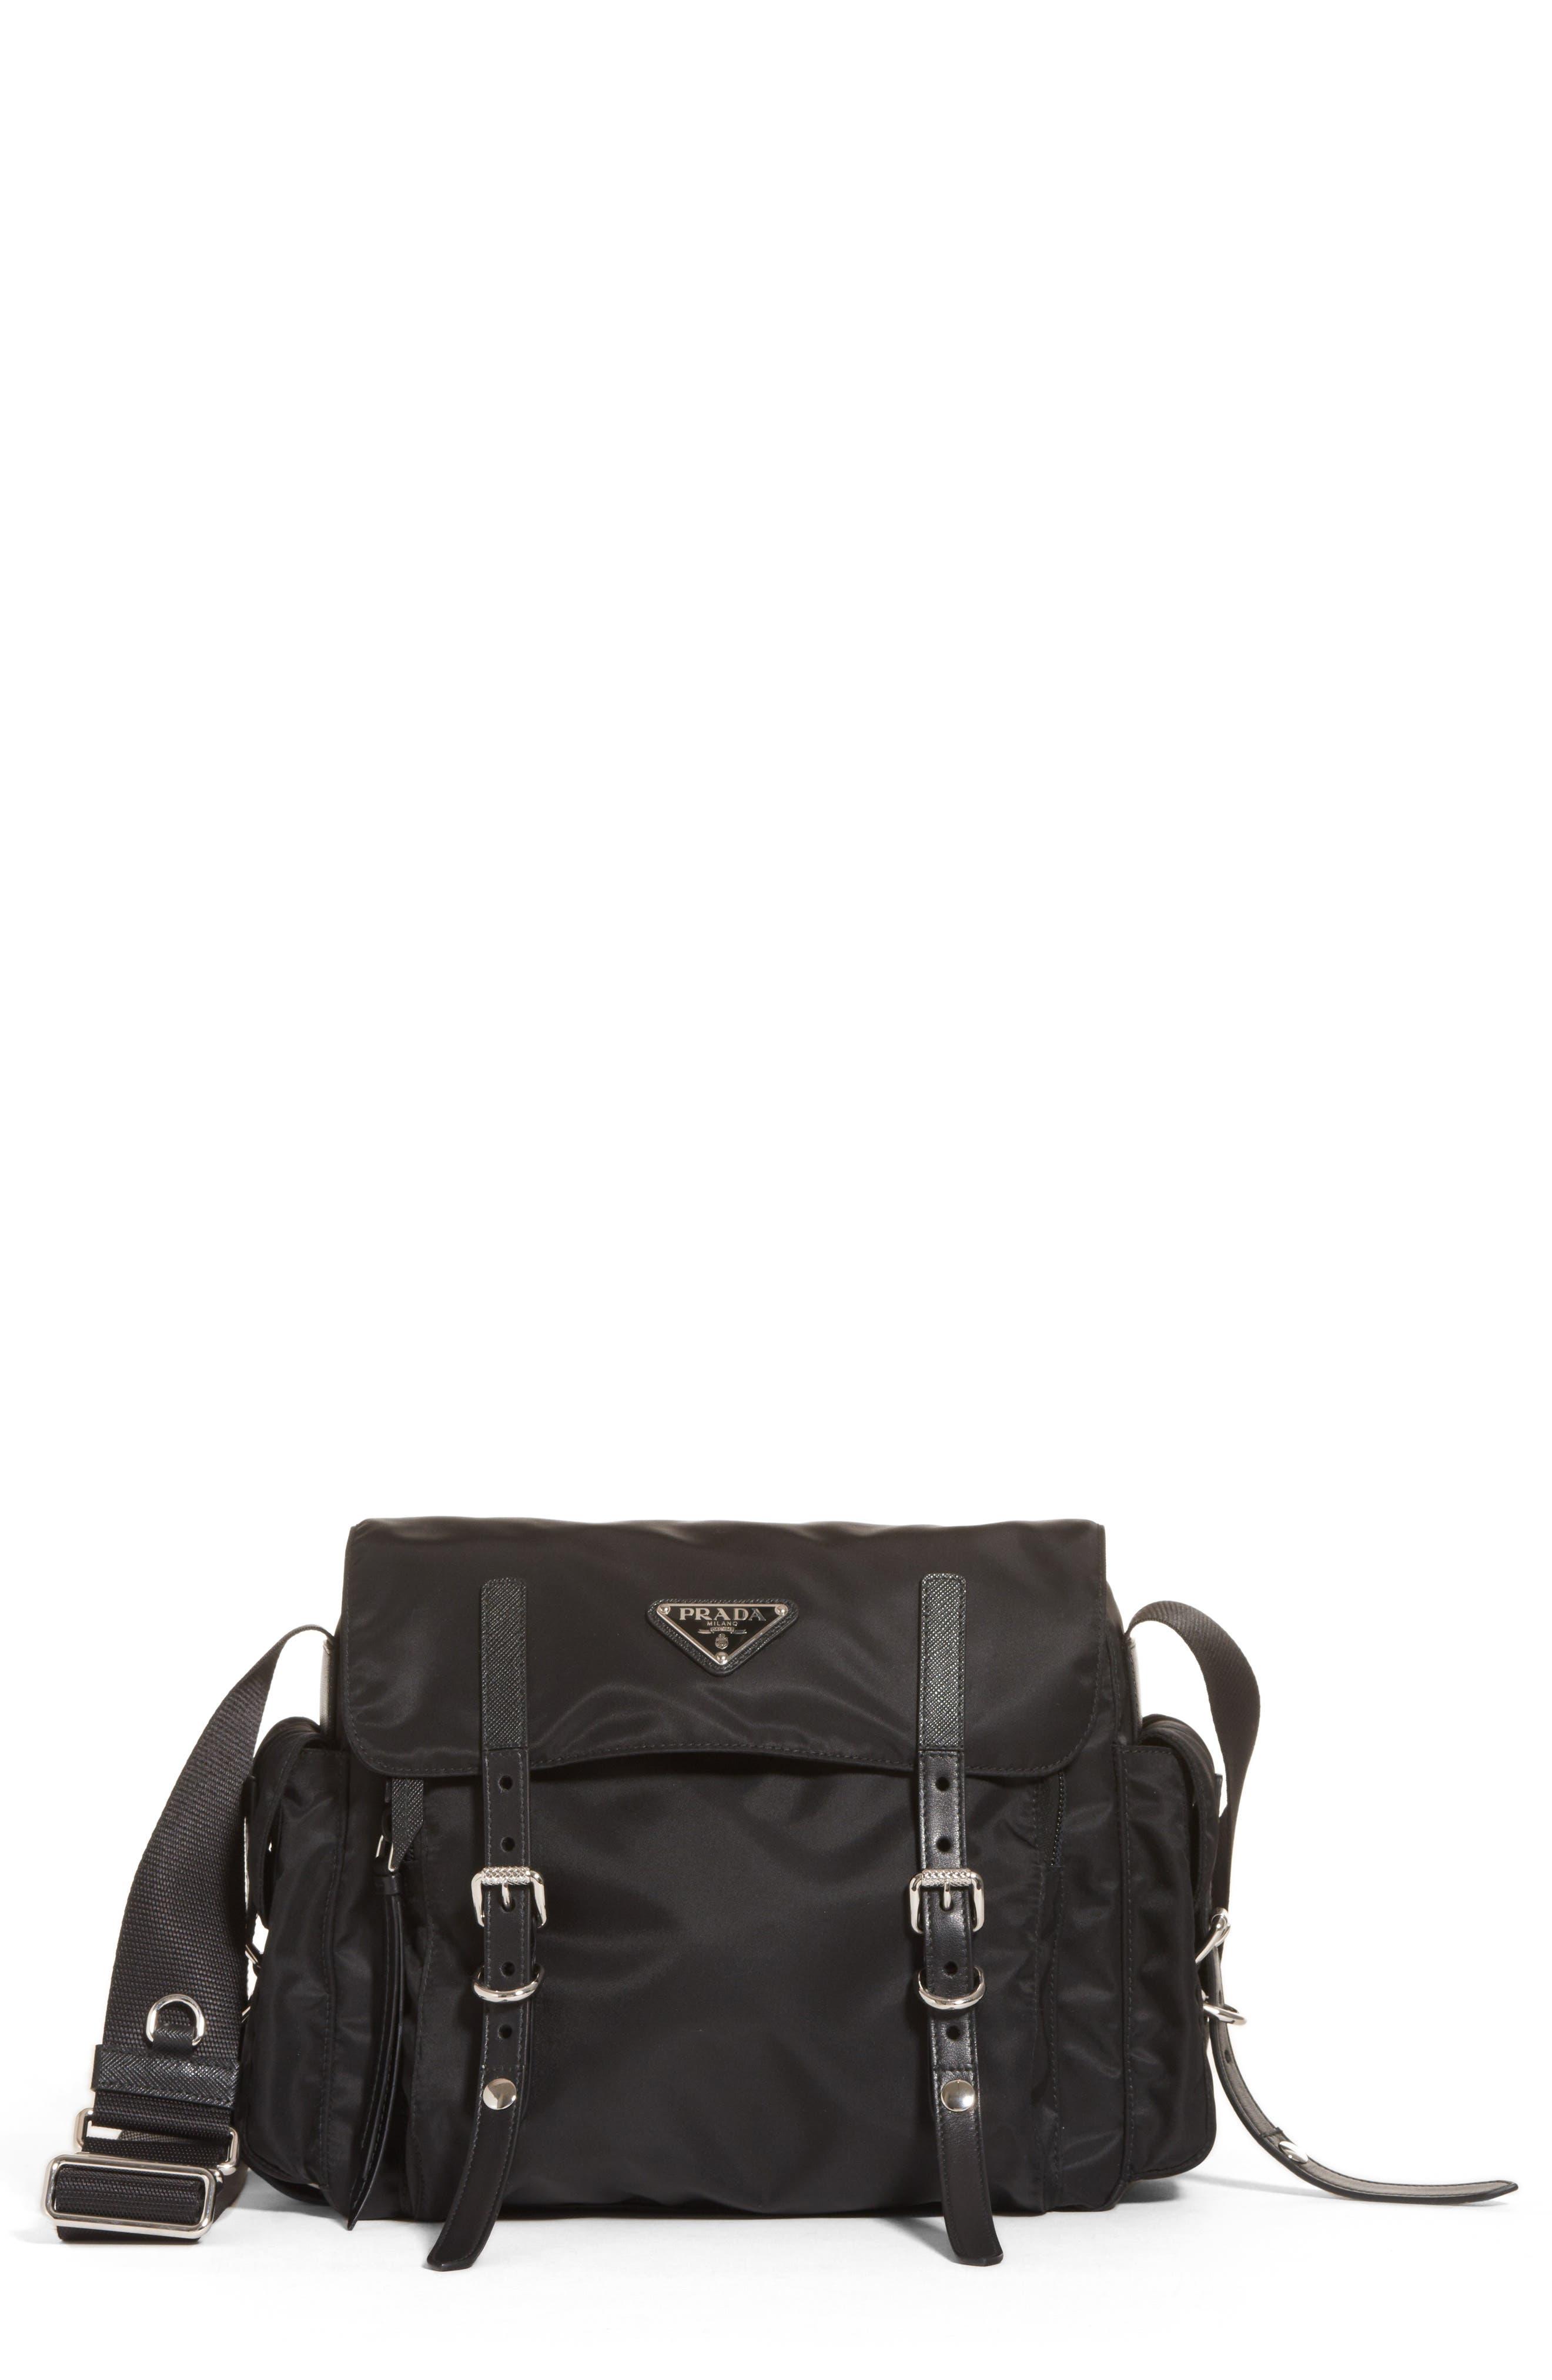 Prada Medium Nylon Messenger Bag